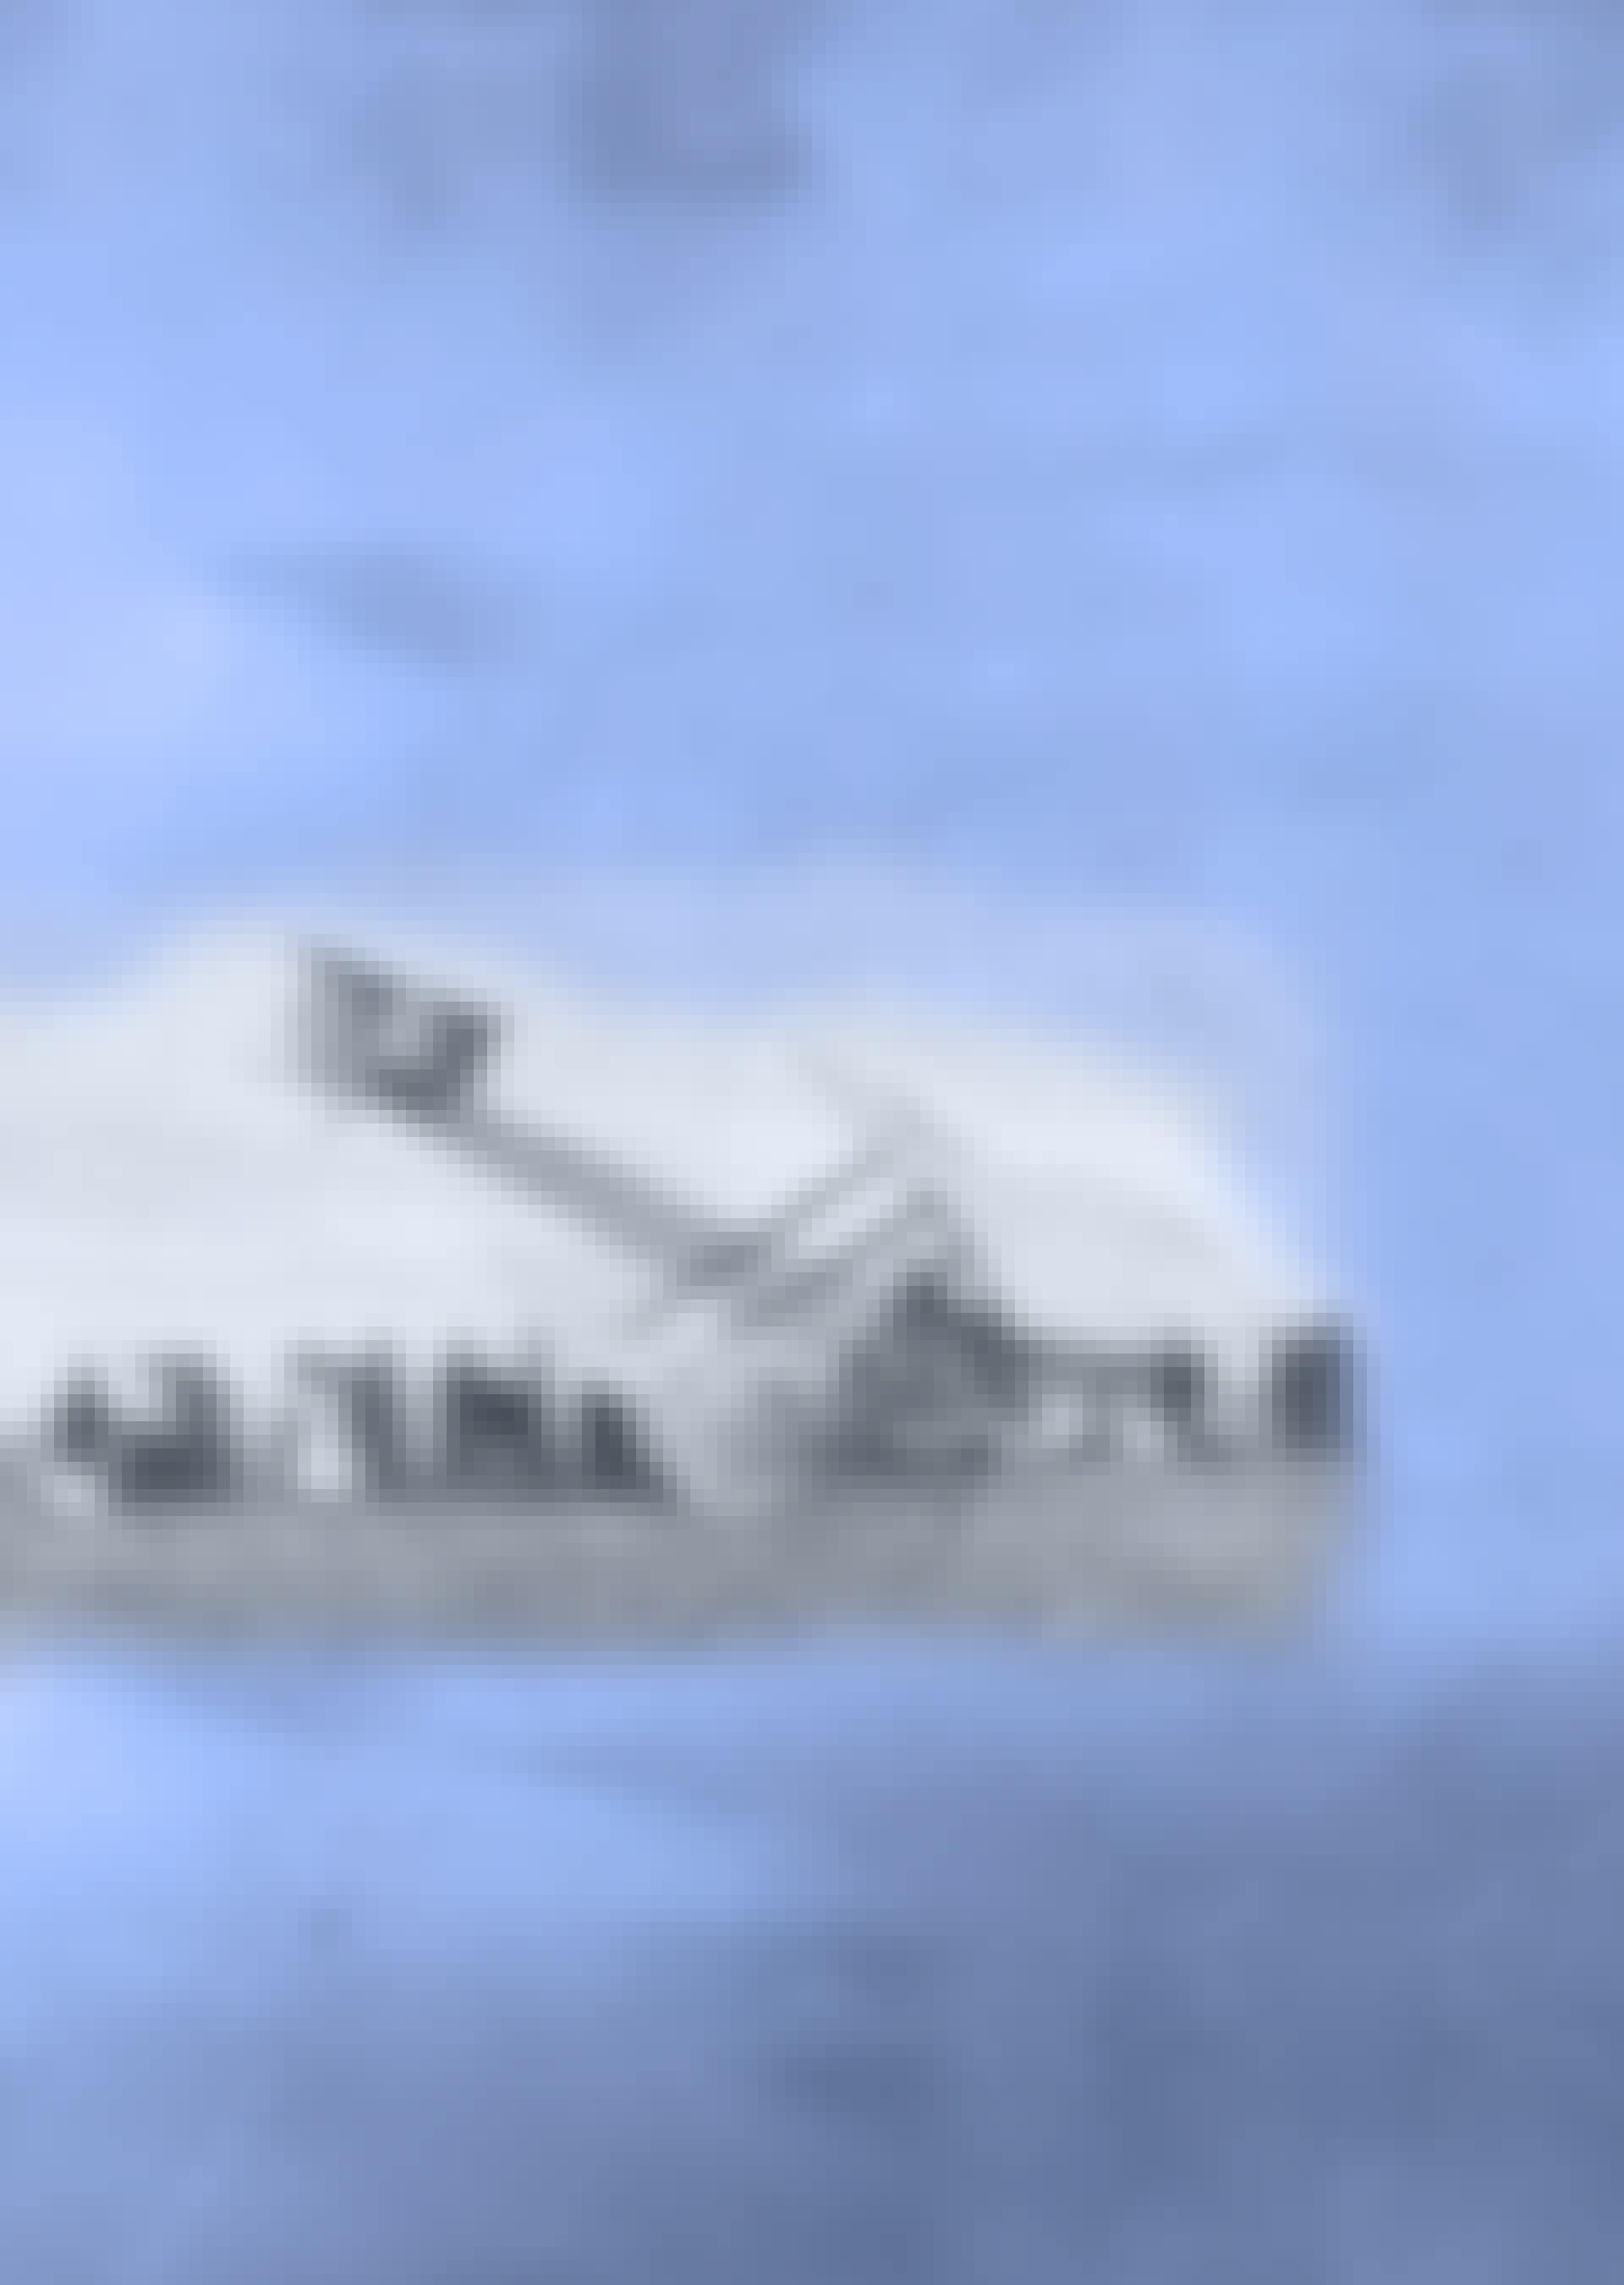 Haveri, atlantflygning, alcock & brown